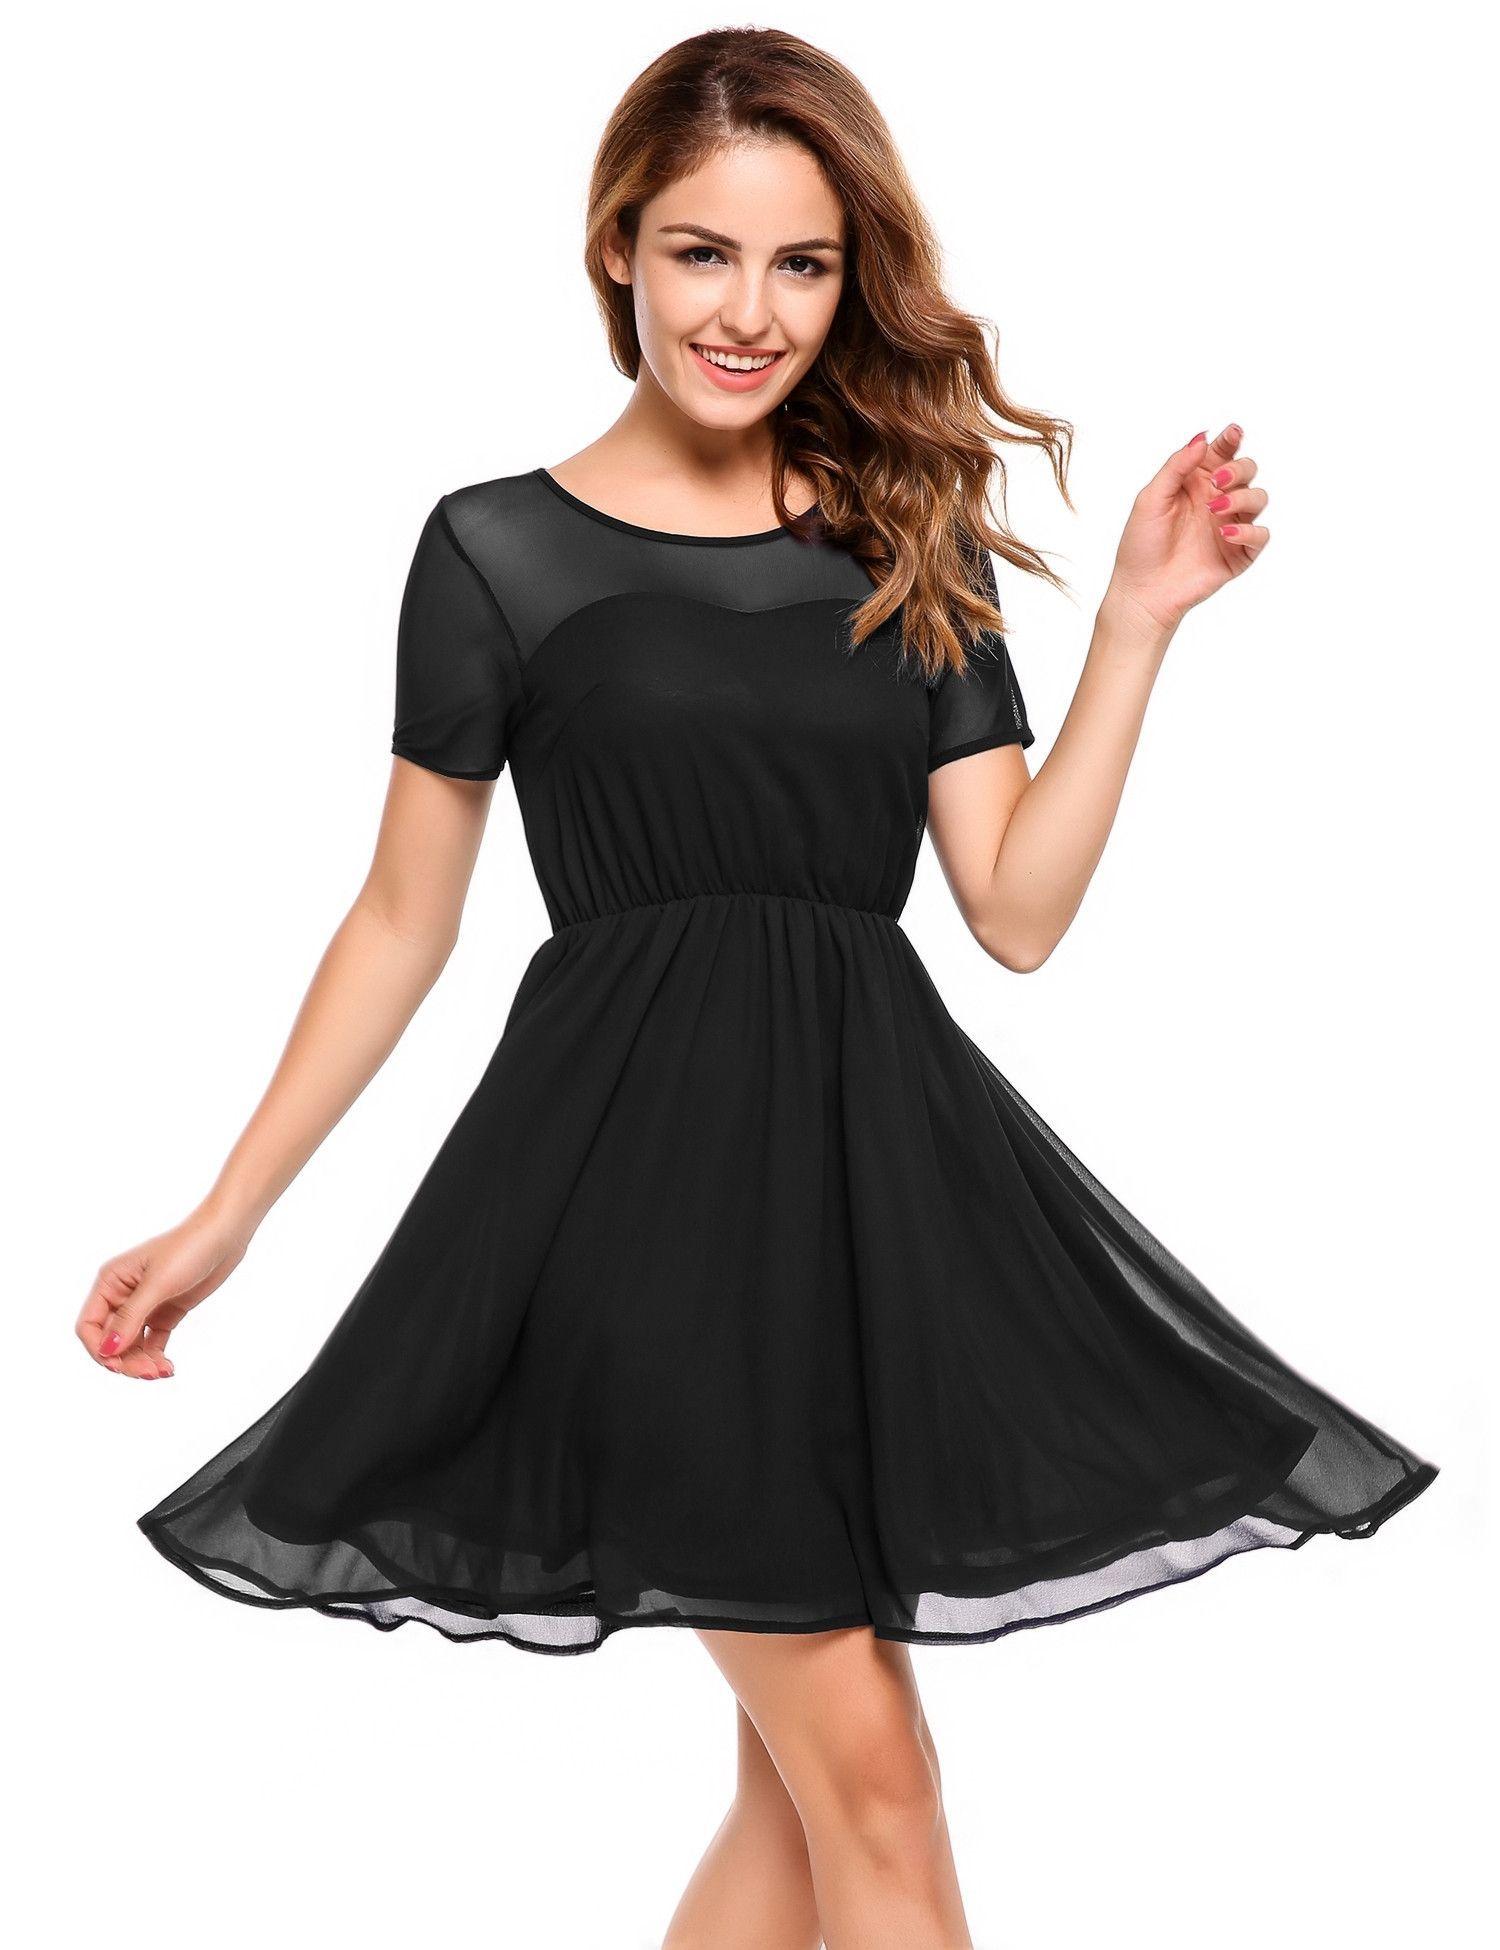 Black Short Sleeve Mesh Chiffon Fit And Flare Dress Flare Dress Casual Summer Dresses Fit And Flare Dress